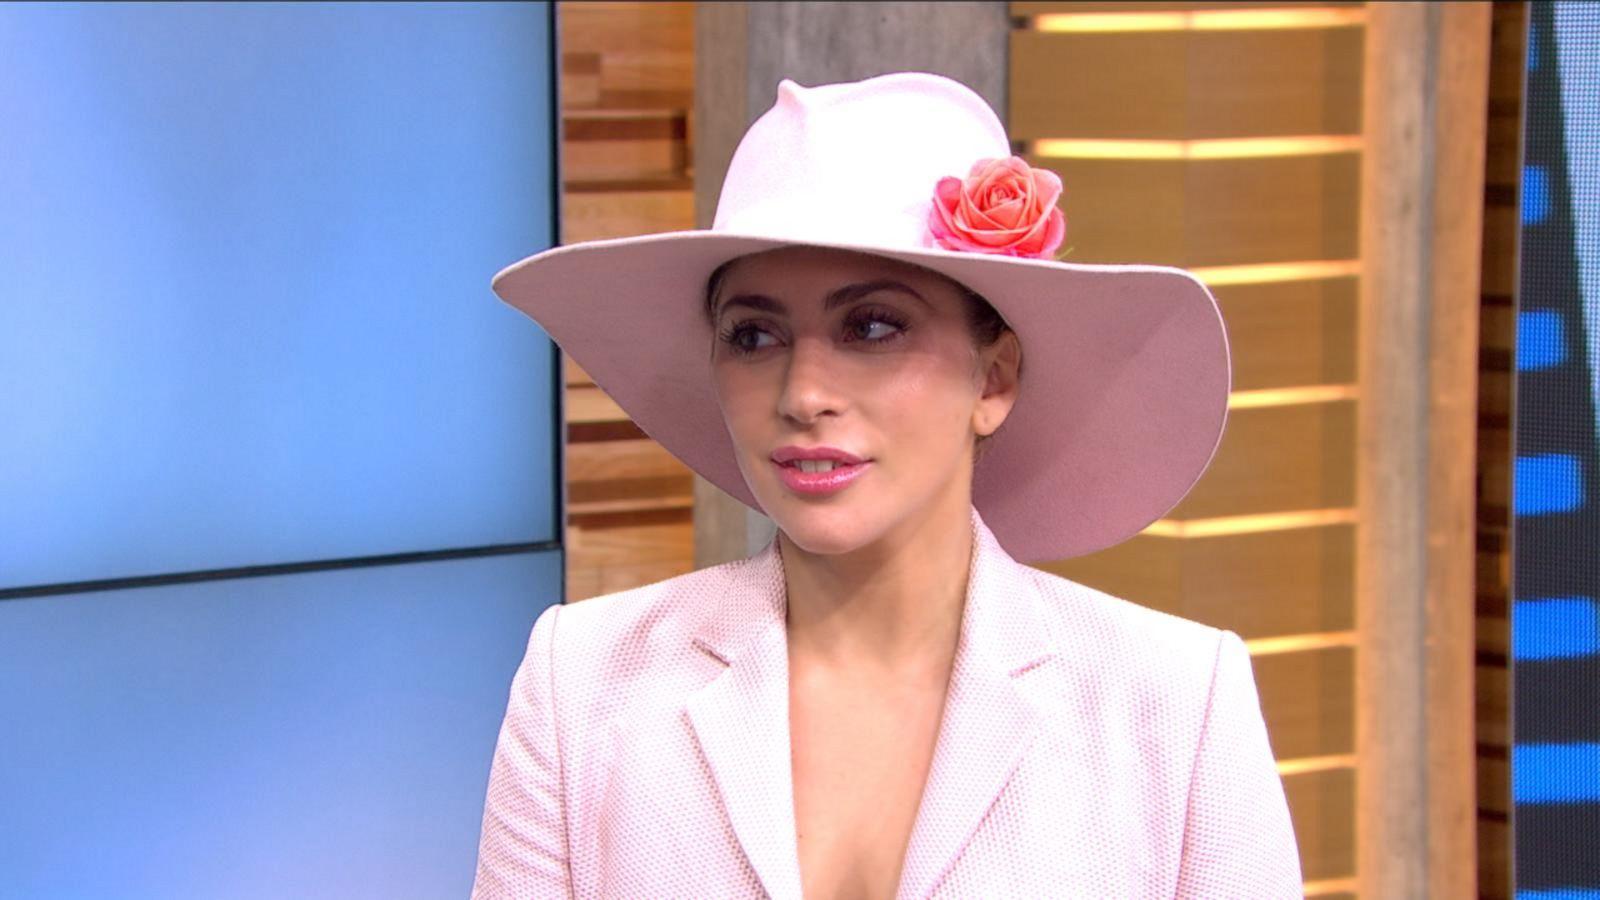 VIDEO: Lady Gaga Talks New Album on 'GMA'